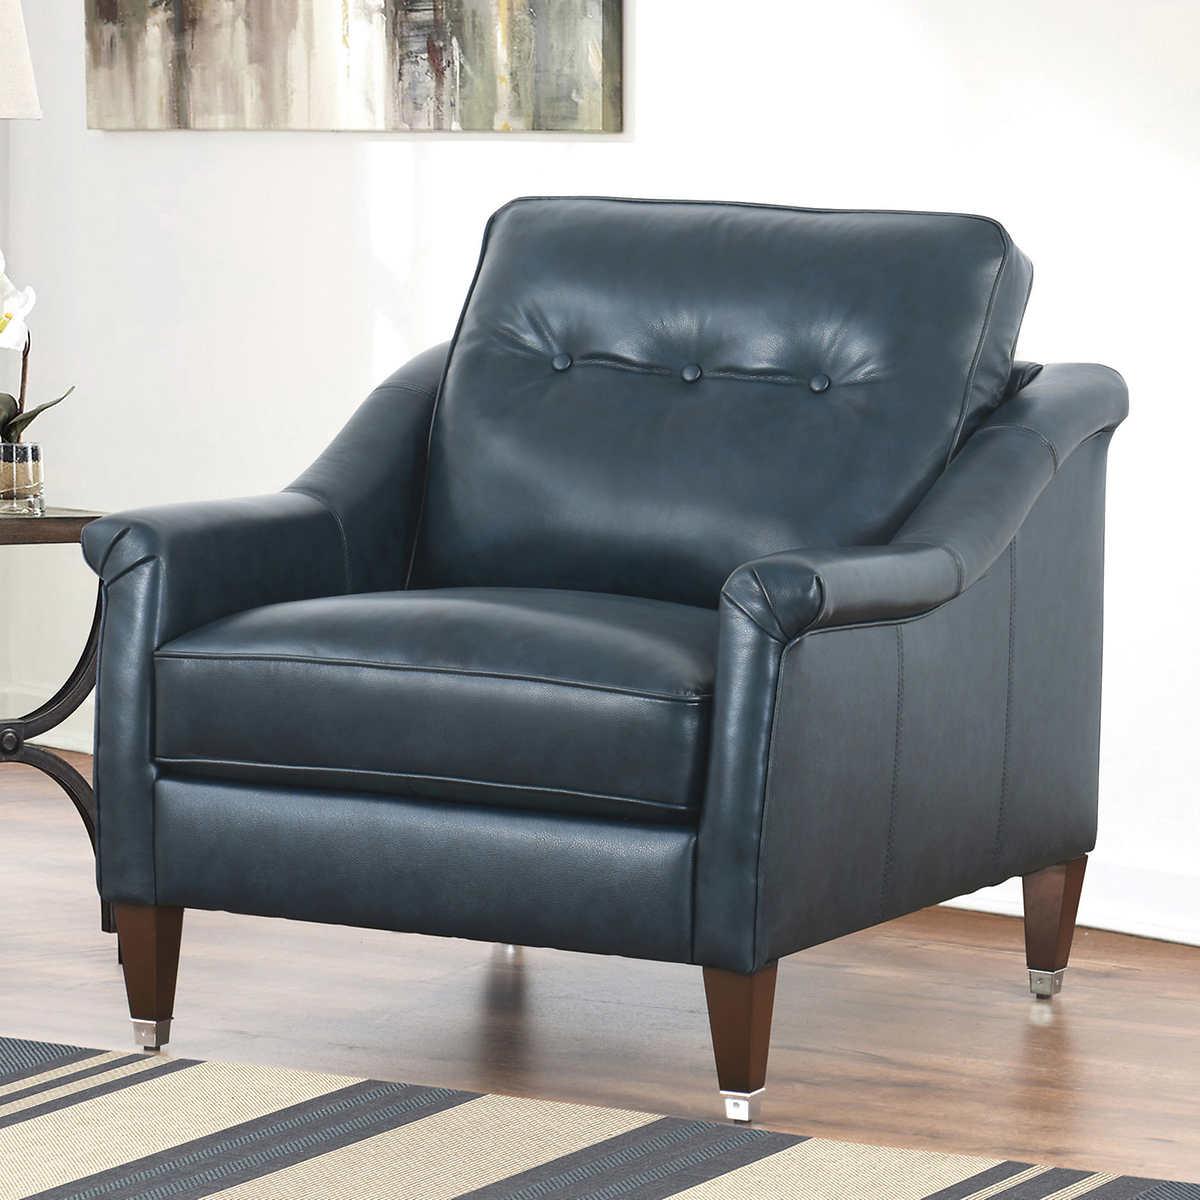 chairs | costco